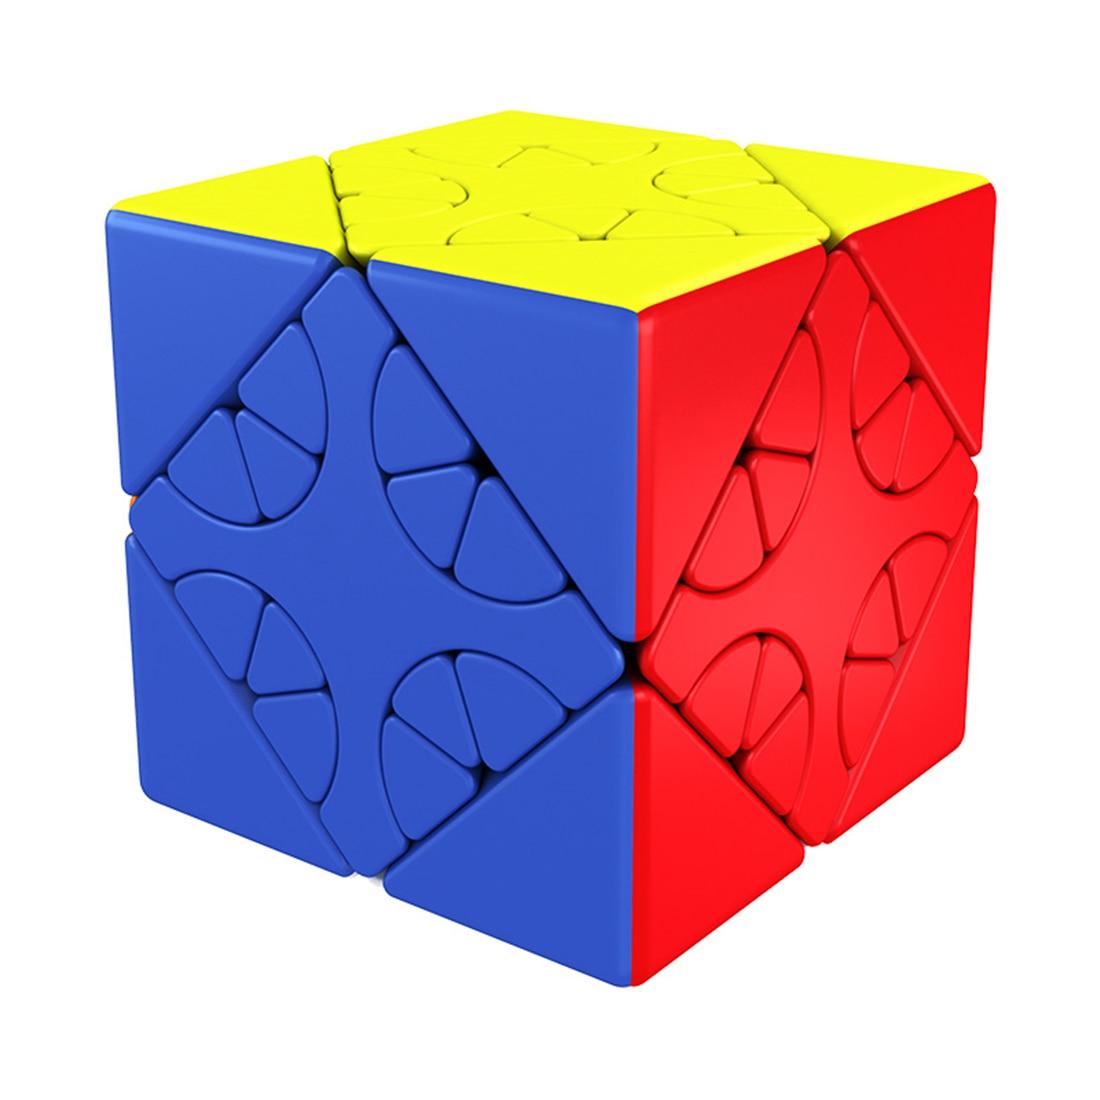 Meilong HunYuan Skewbcube sihirli küp hız küp eğitim bulmaca oyuncak-No. 3